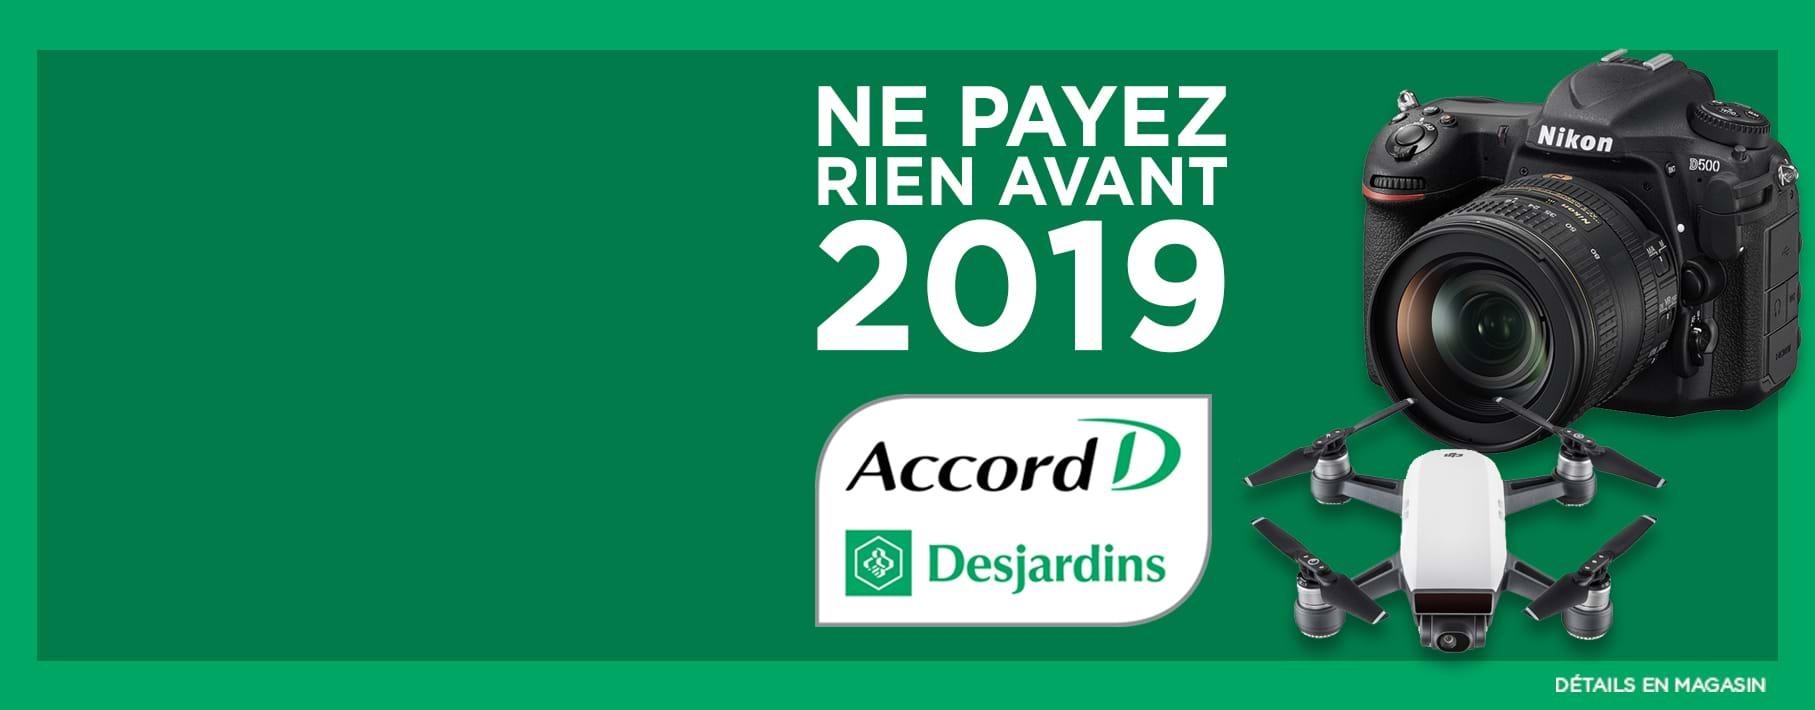 Accord D 2019